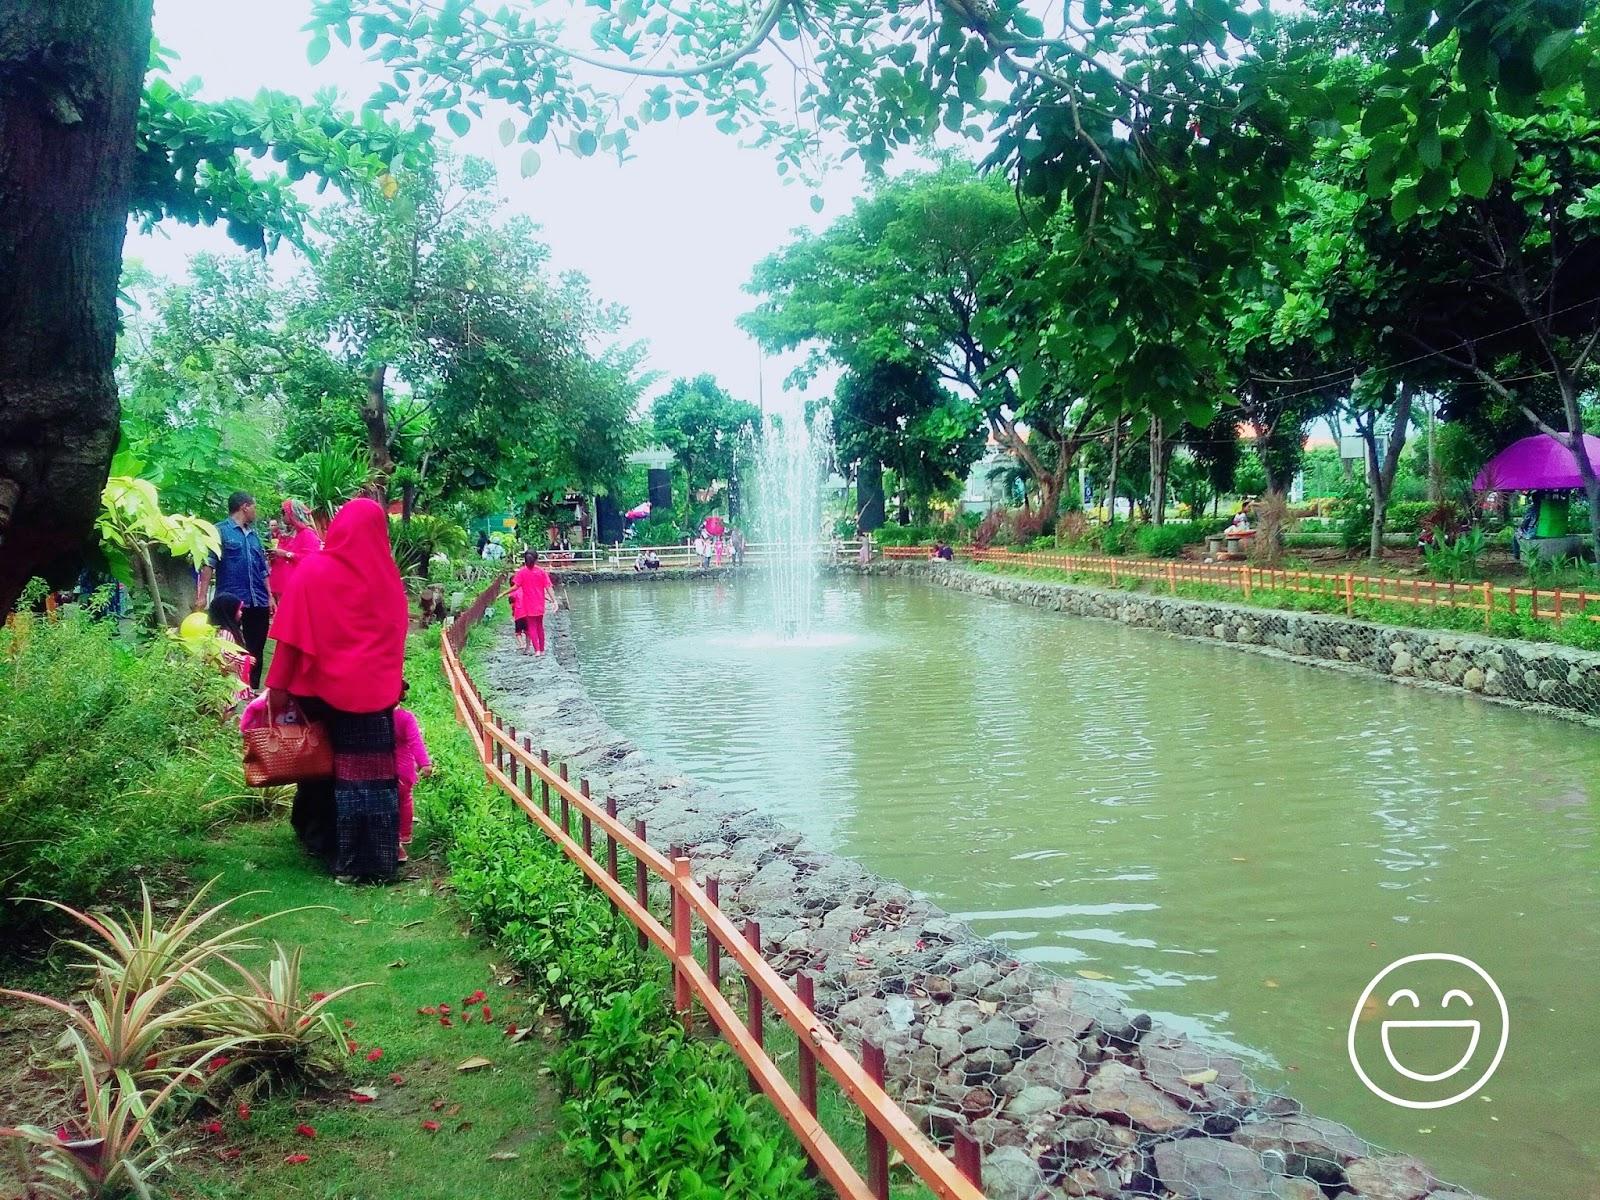 Wisata Keluarga Sidoarjo Taman Abhirama Haya Zone View Kab